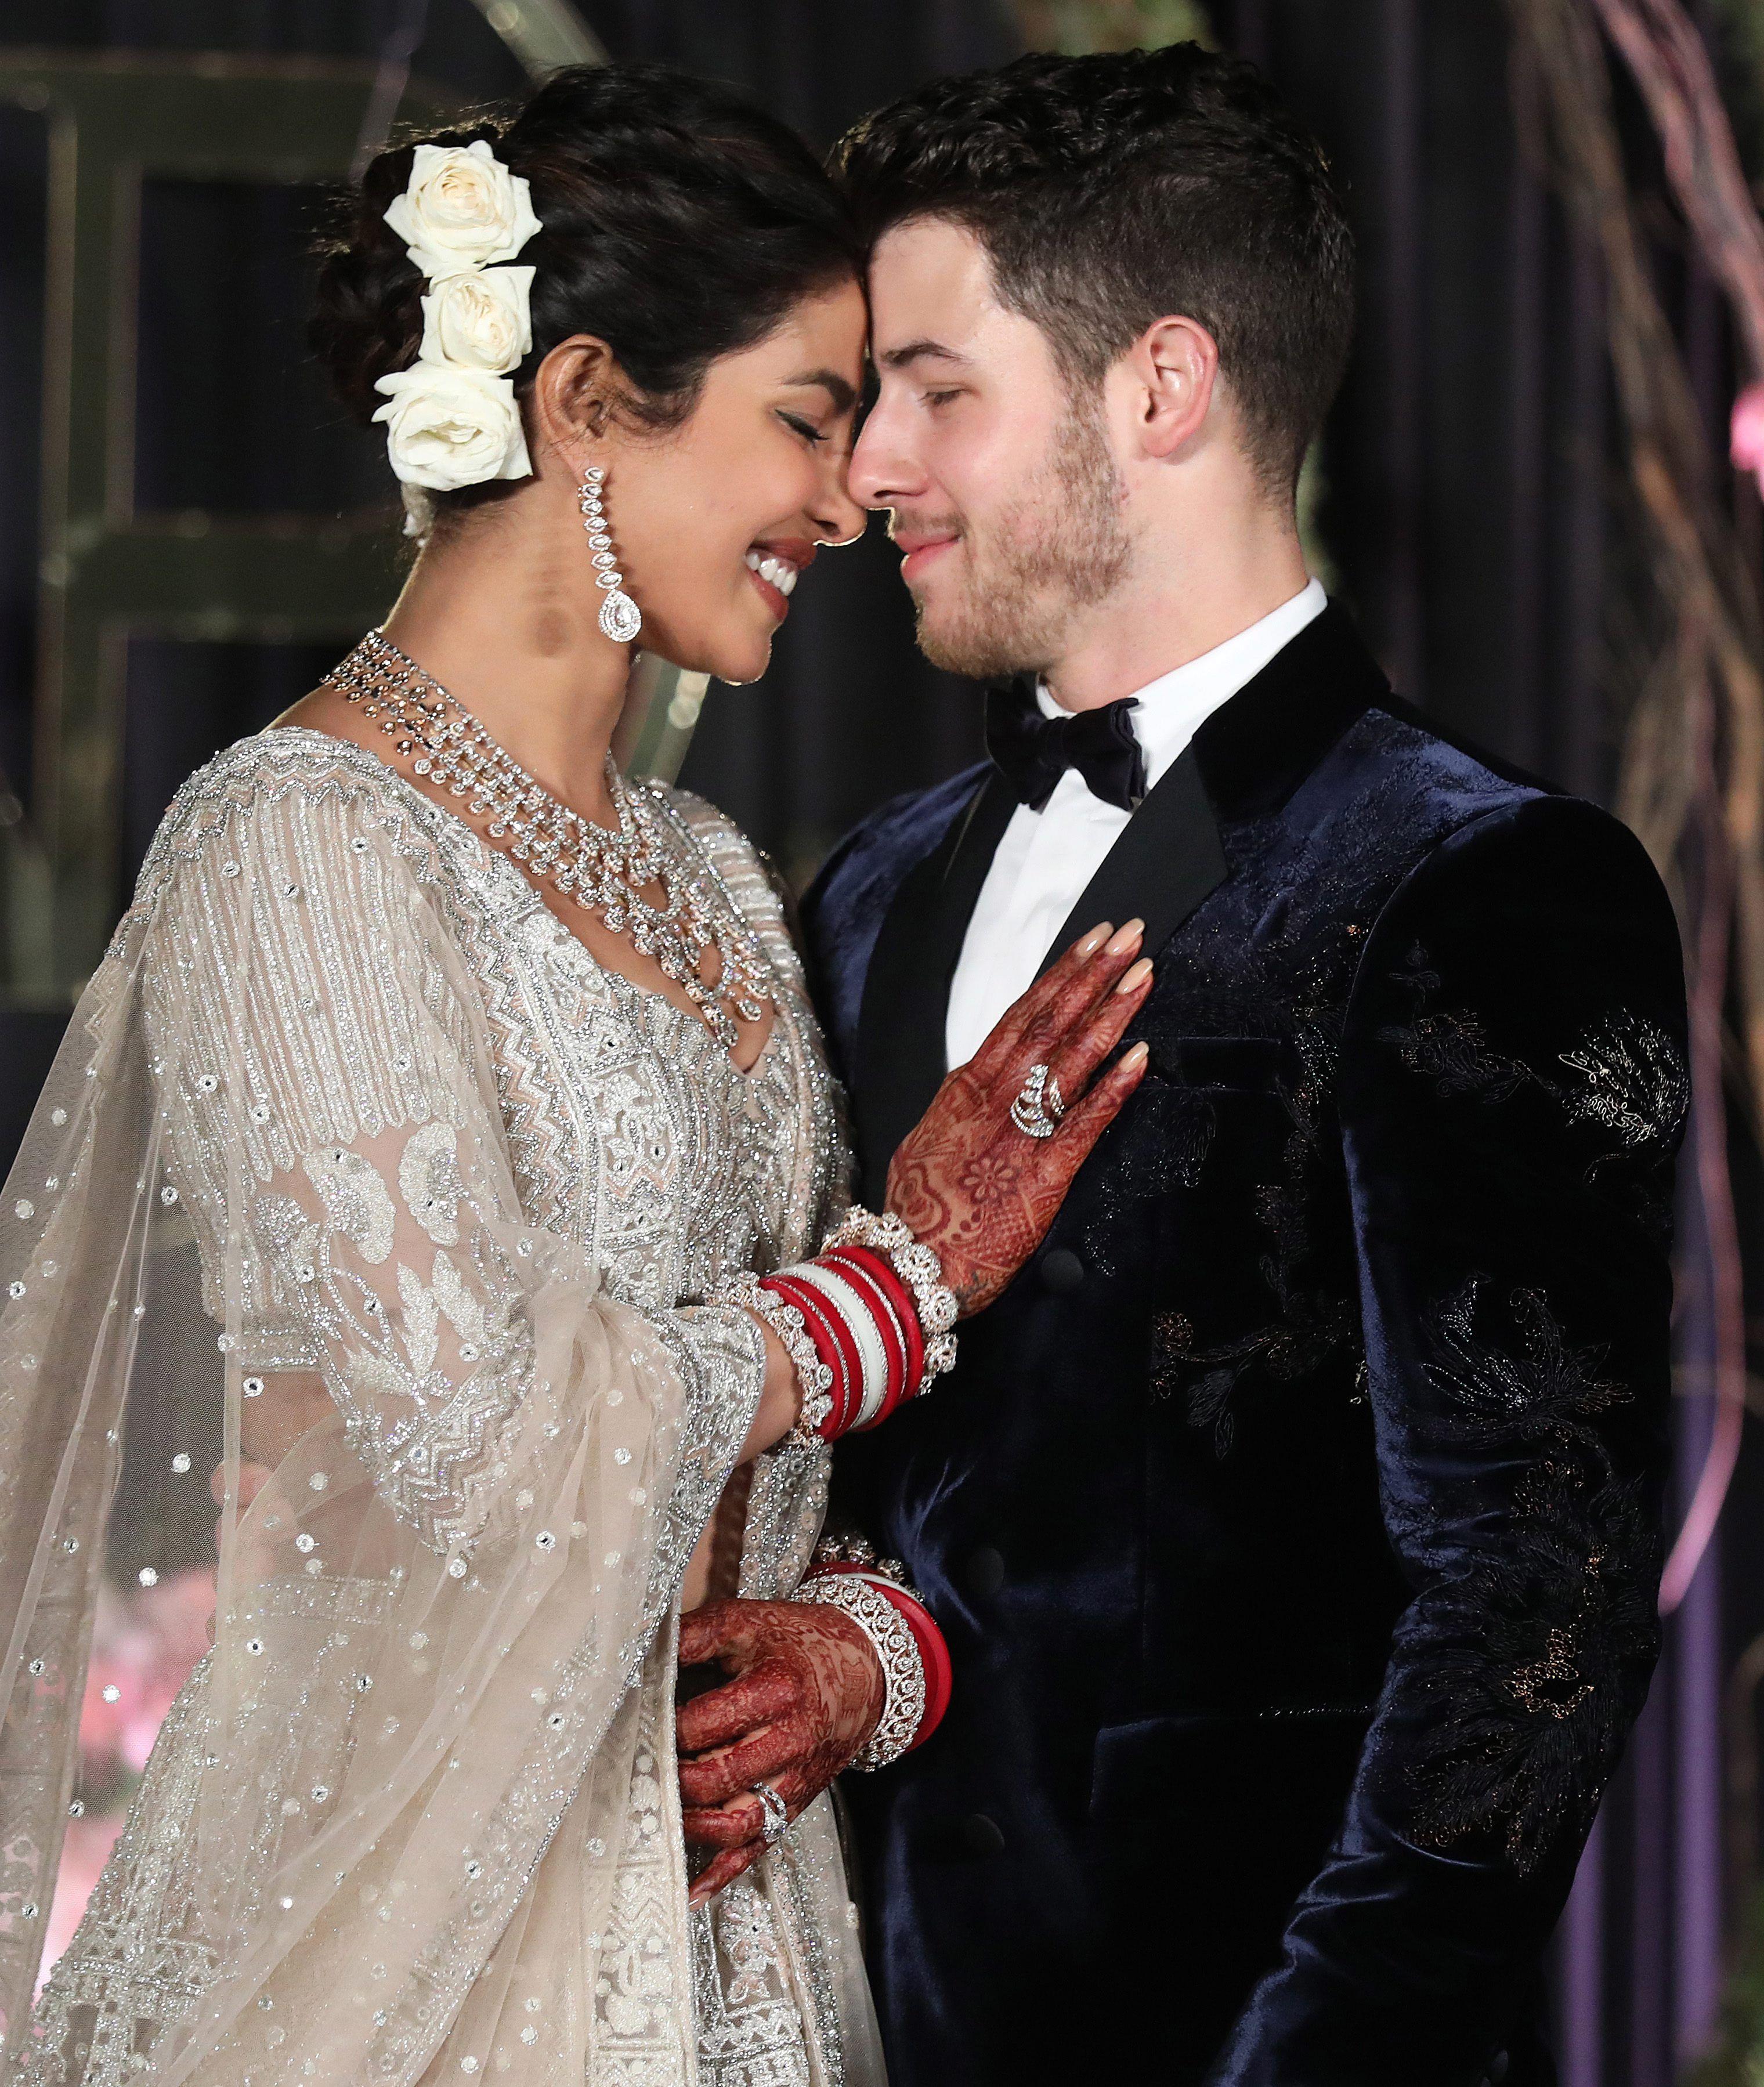 Things You Didn't Know About Nick Jonas And Priyanka